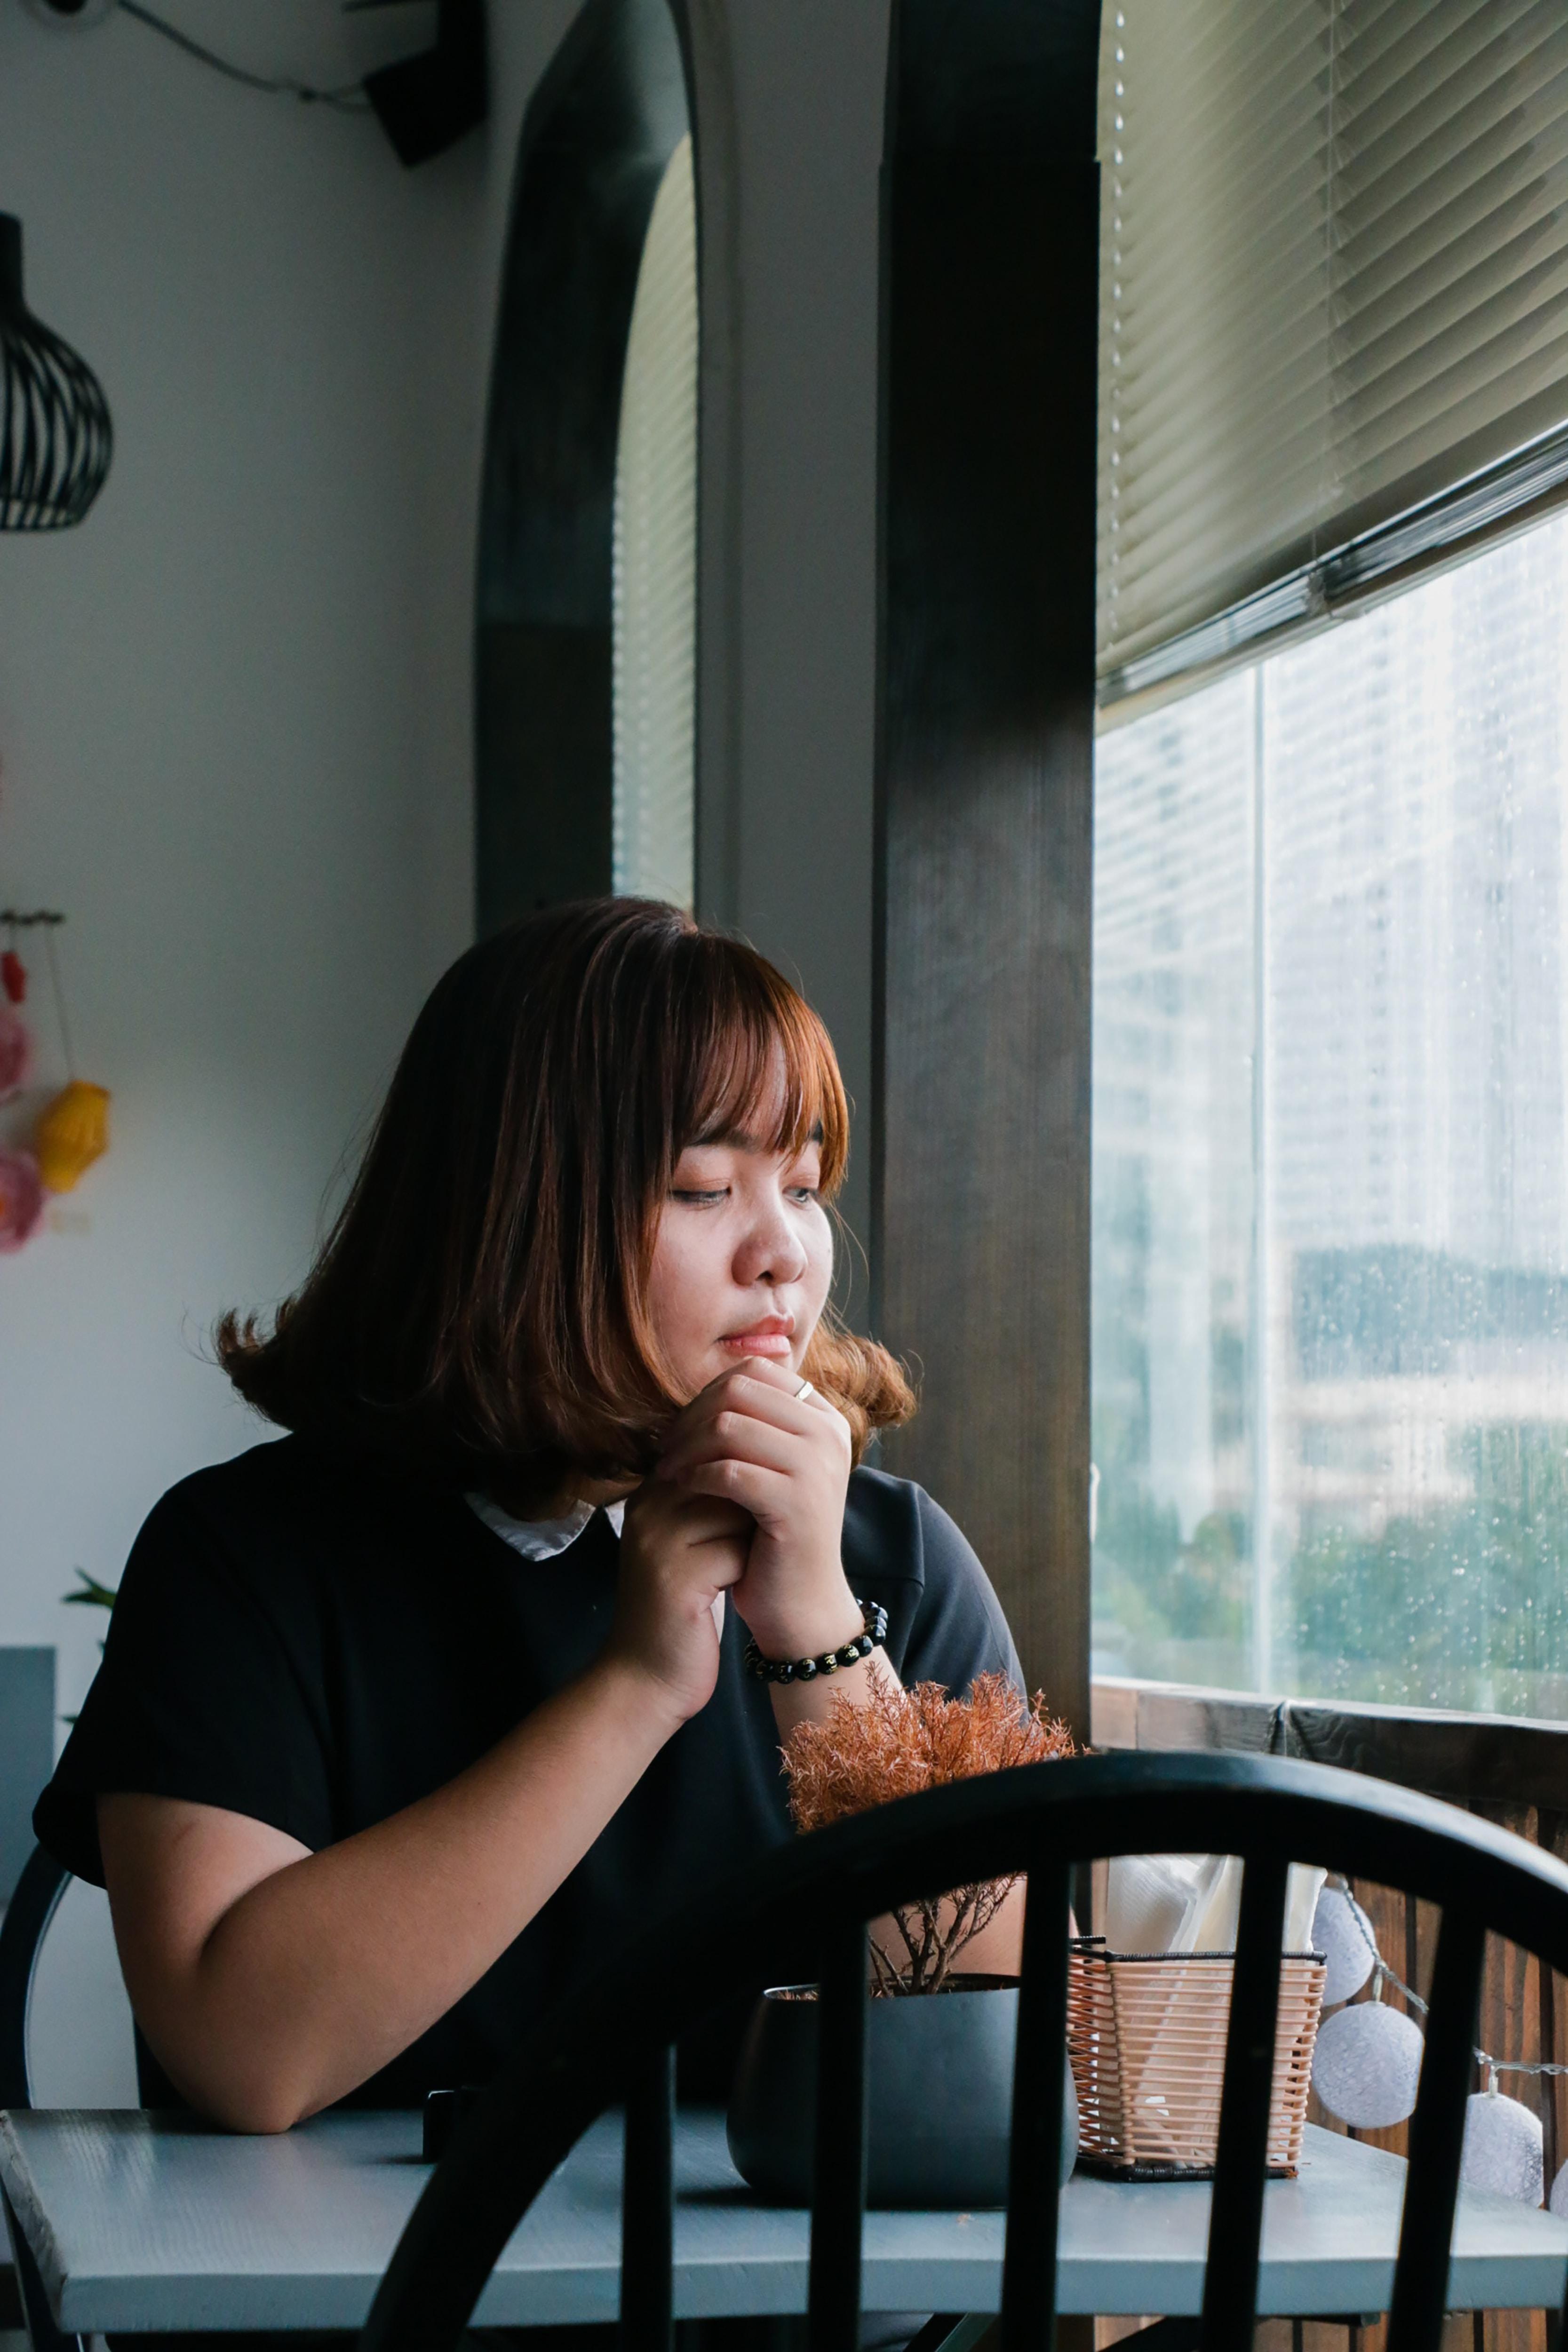 woman sitting near clear glass window